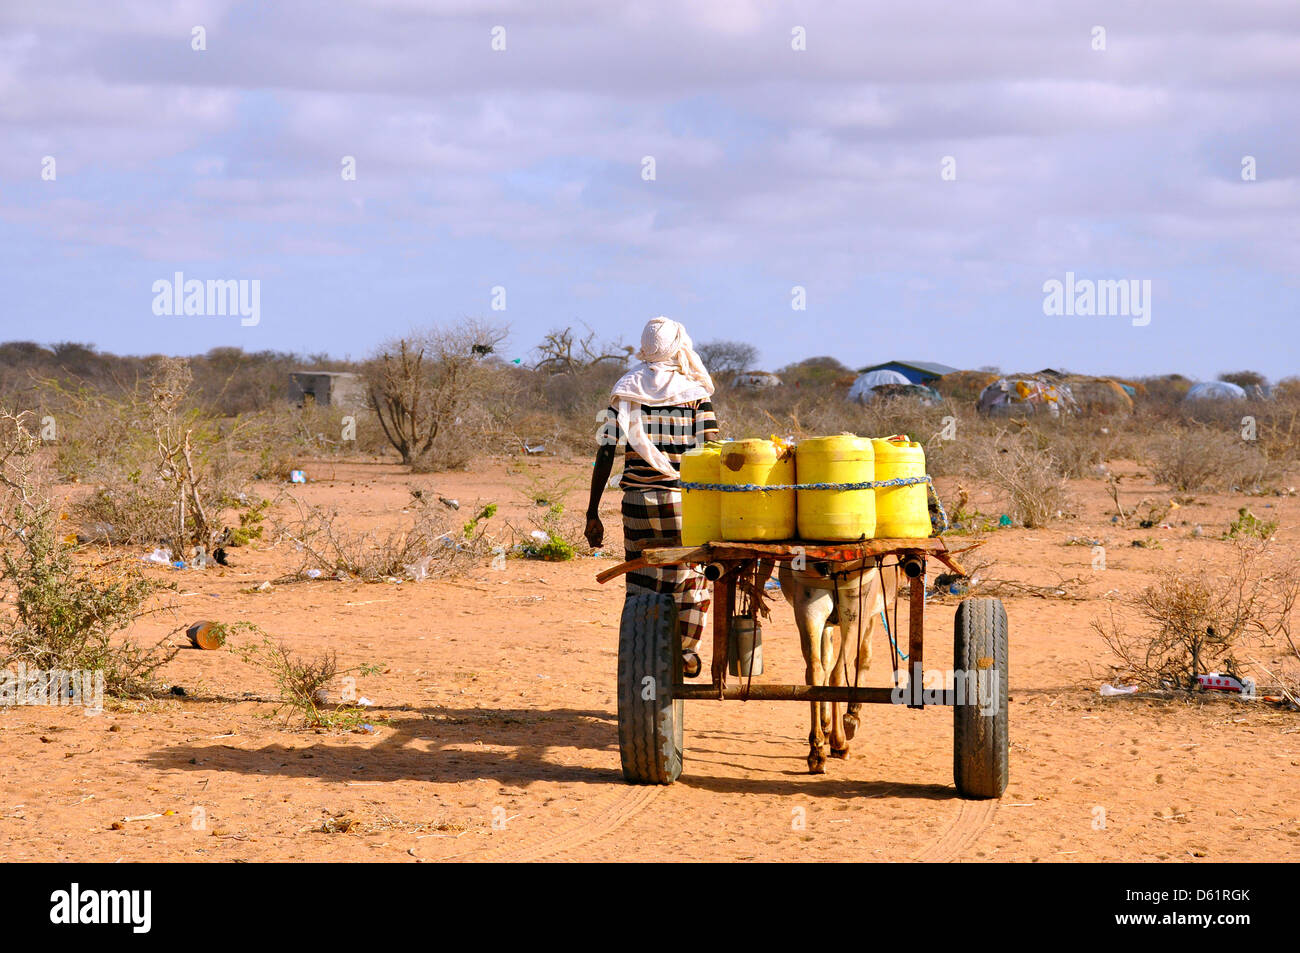 Somali migrant camp Garissa Kenya water-bearing male - Stock Image